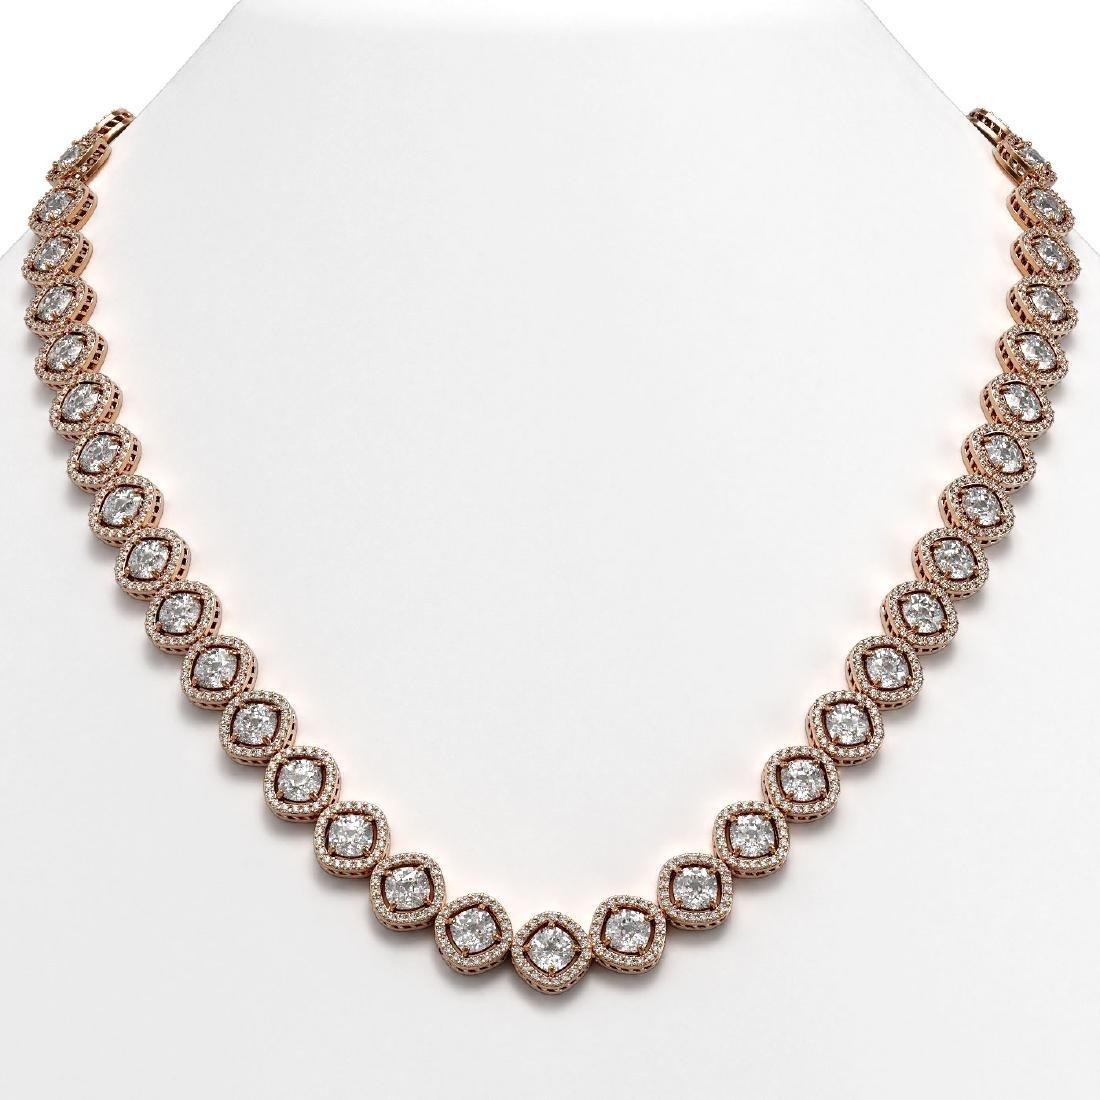 29.37 CTW Cushion Cut Diamond Designer Necklace 18K